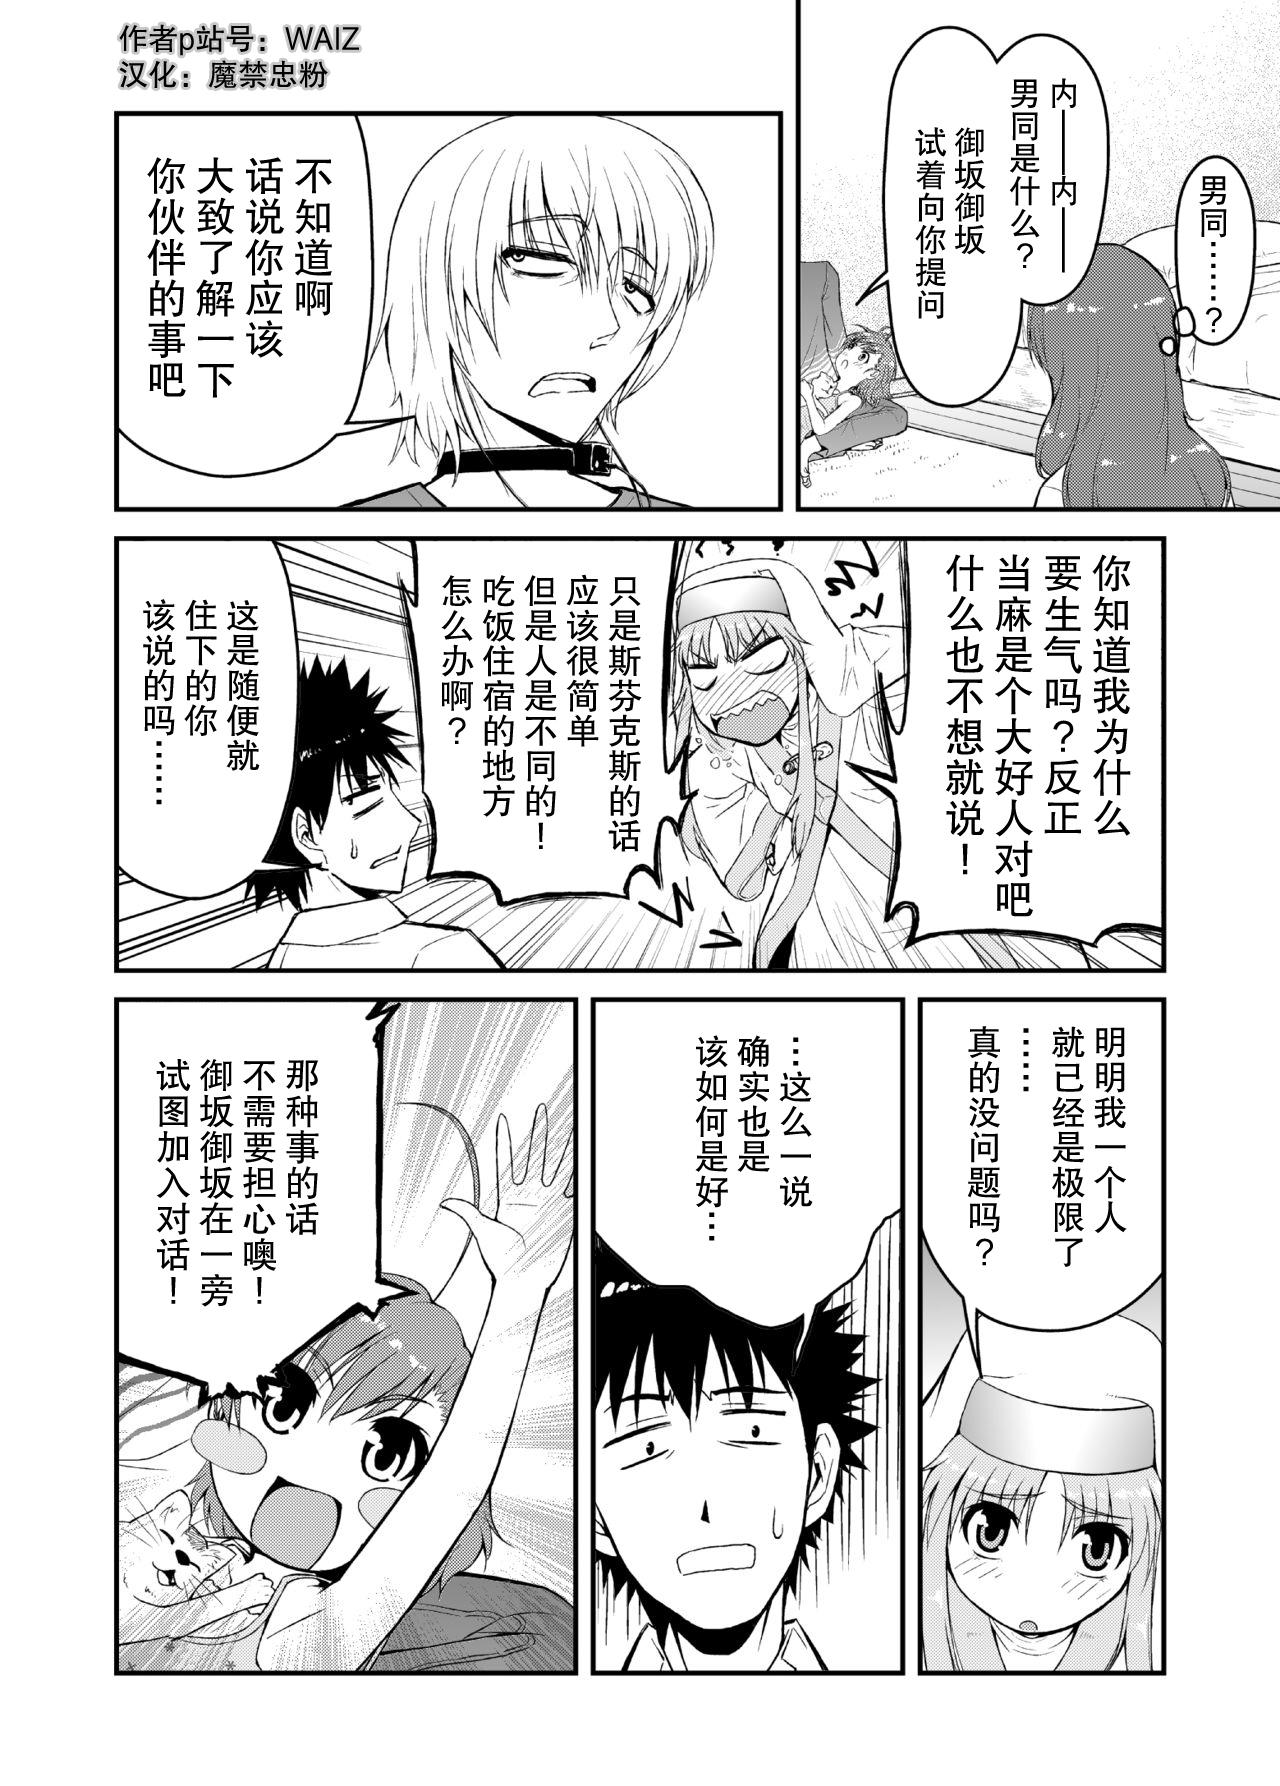 [WAIZ][同人个人渣汉化][就算是上条先生我家要住7个人还是太勉强了](Toaru Majutsu no Index) [中国翻译] 35